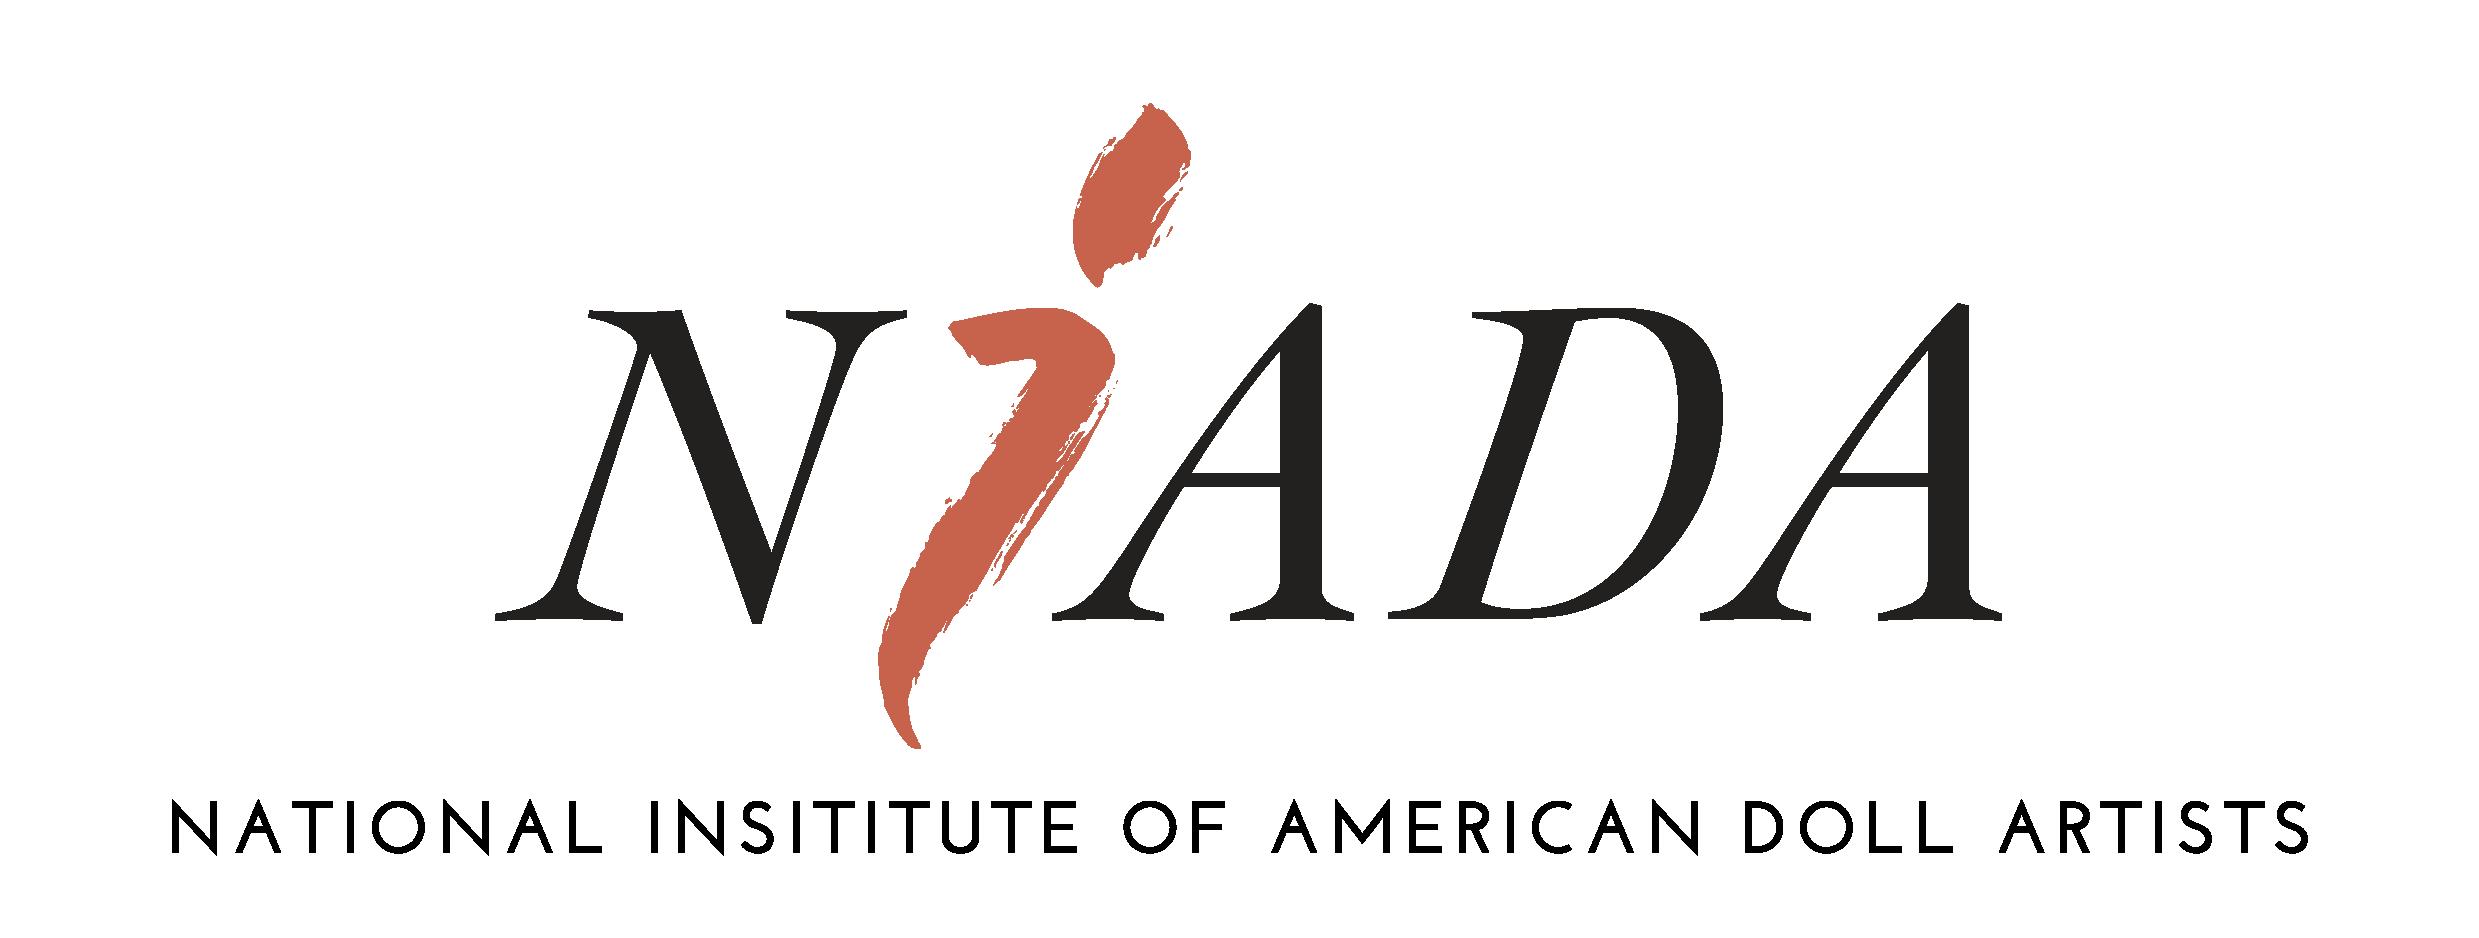 NIADA_Web_Logo2-01